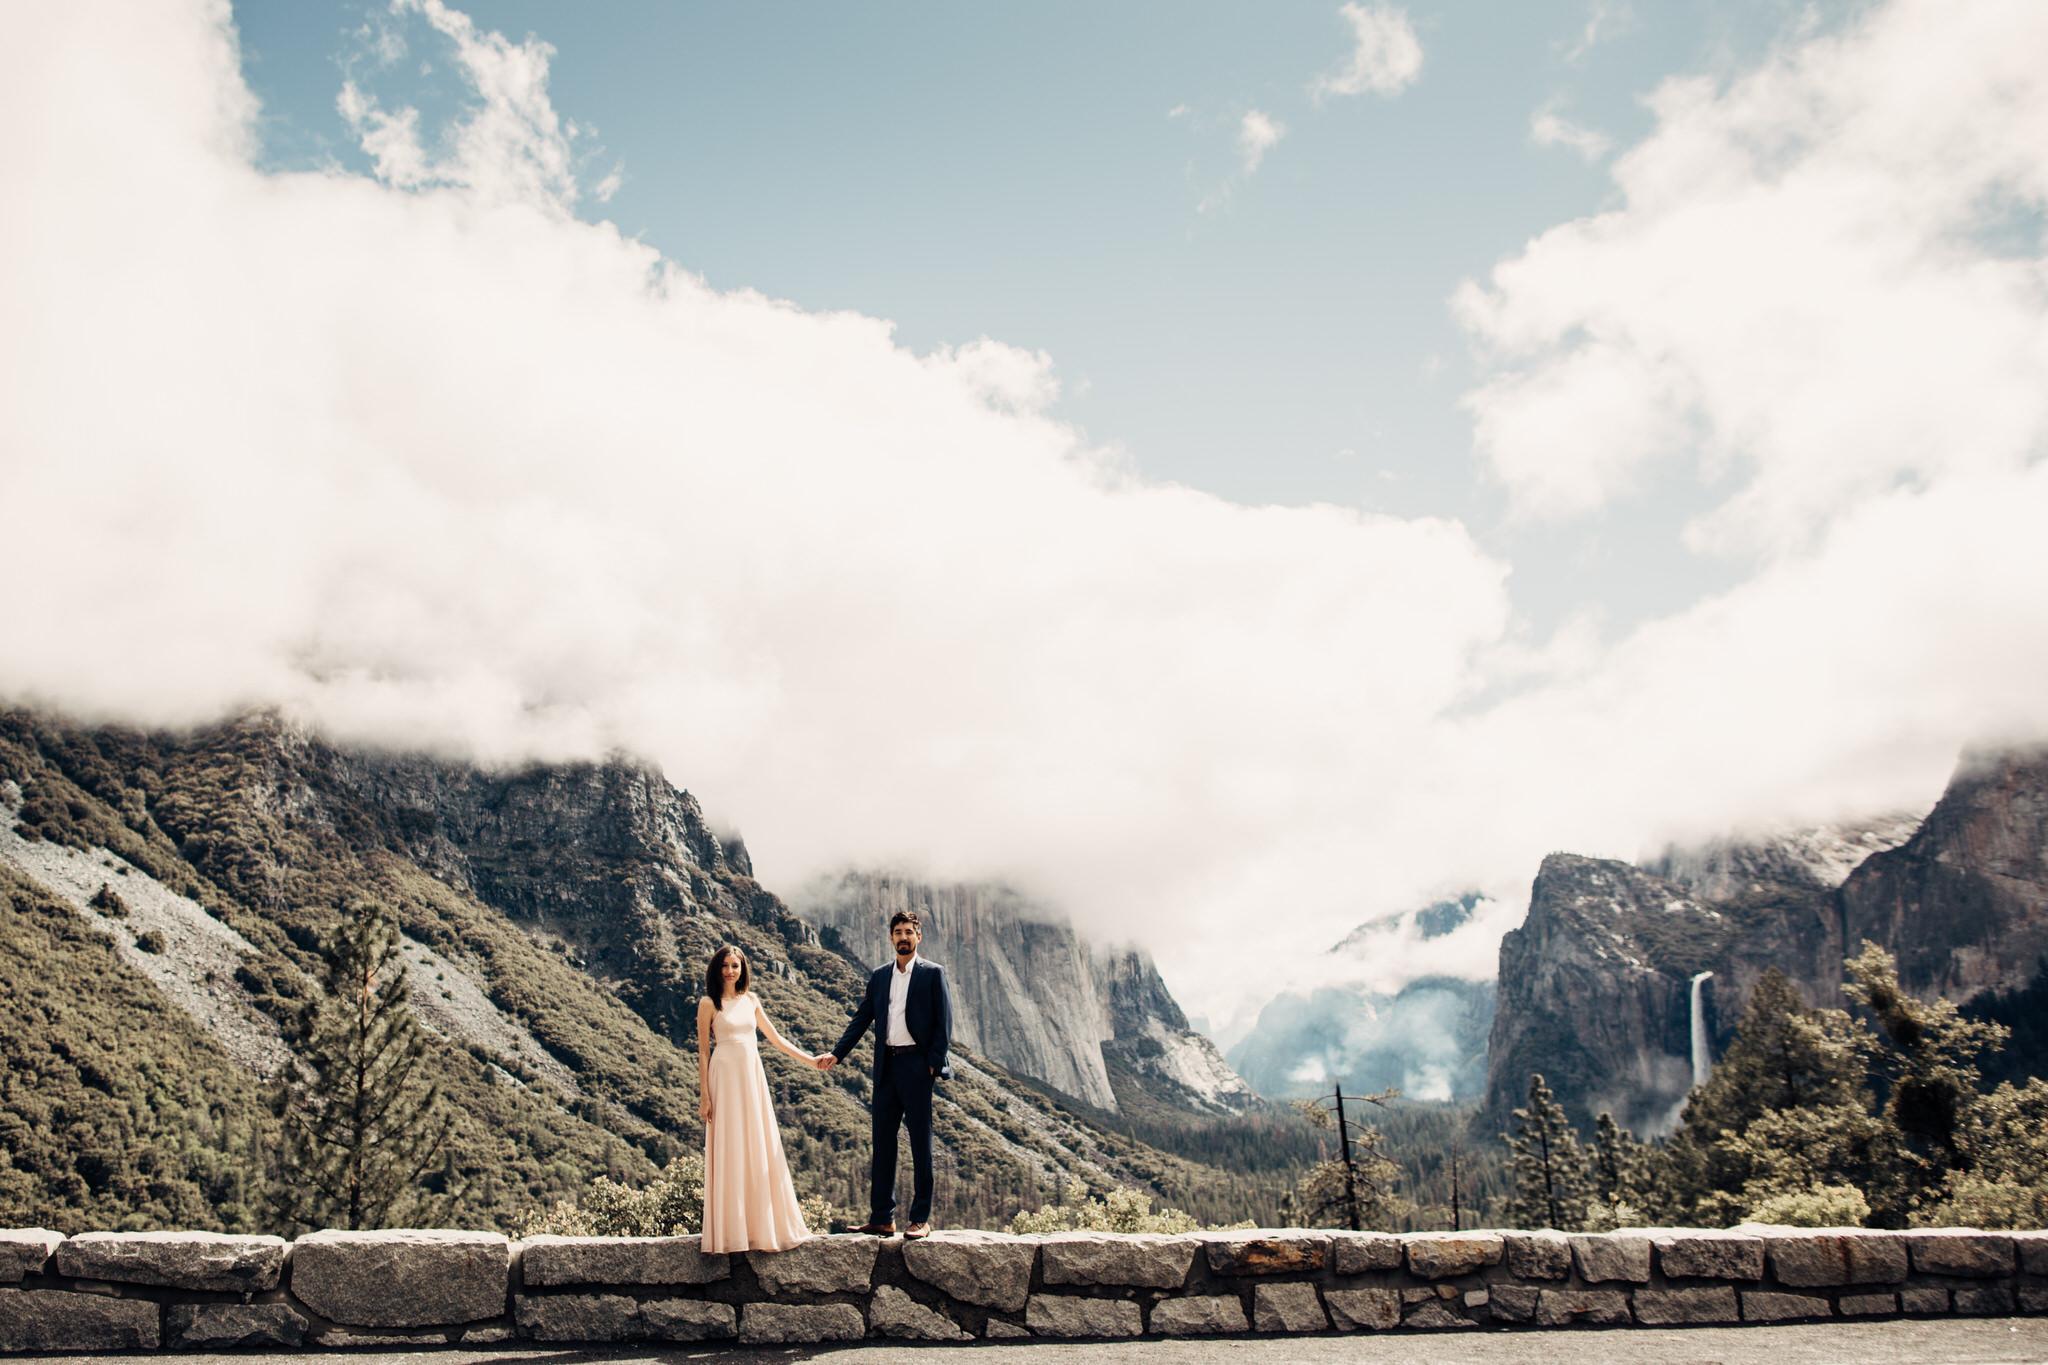 Yosemite-engagement-session-lauren-and-tom81.jpg